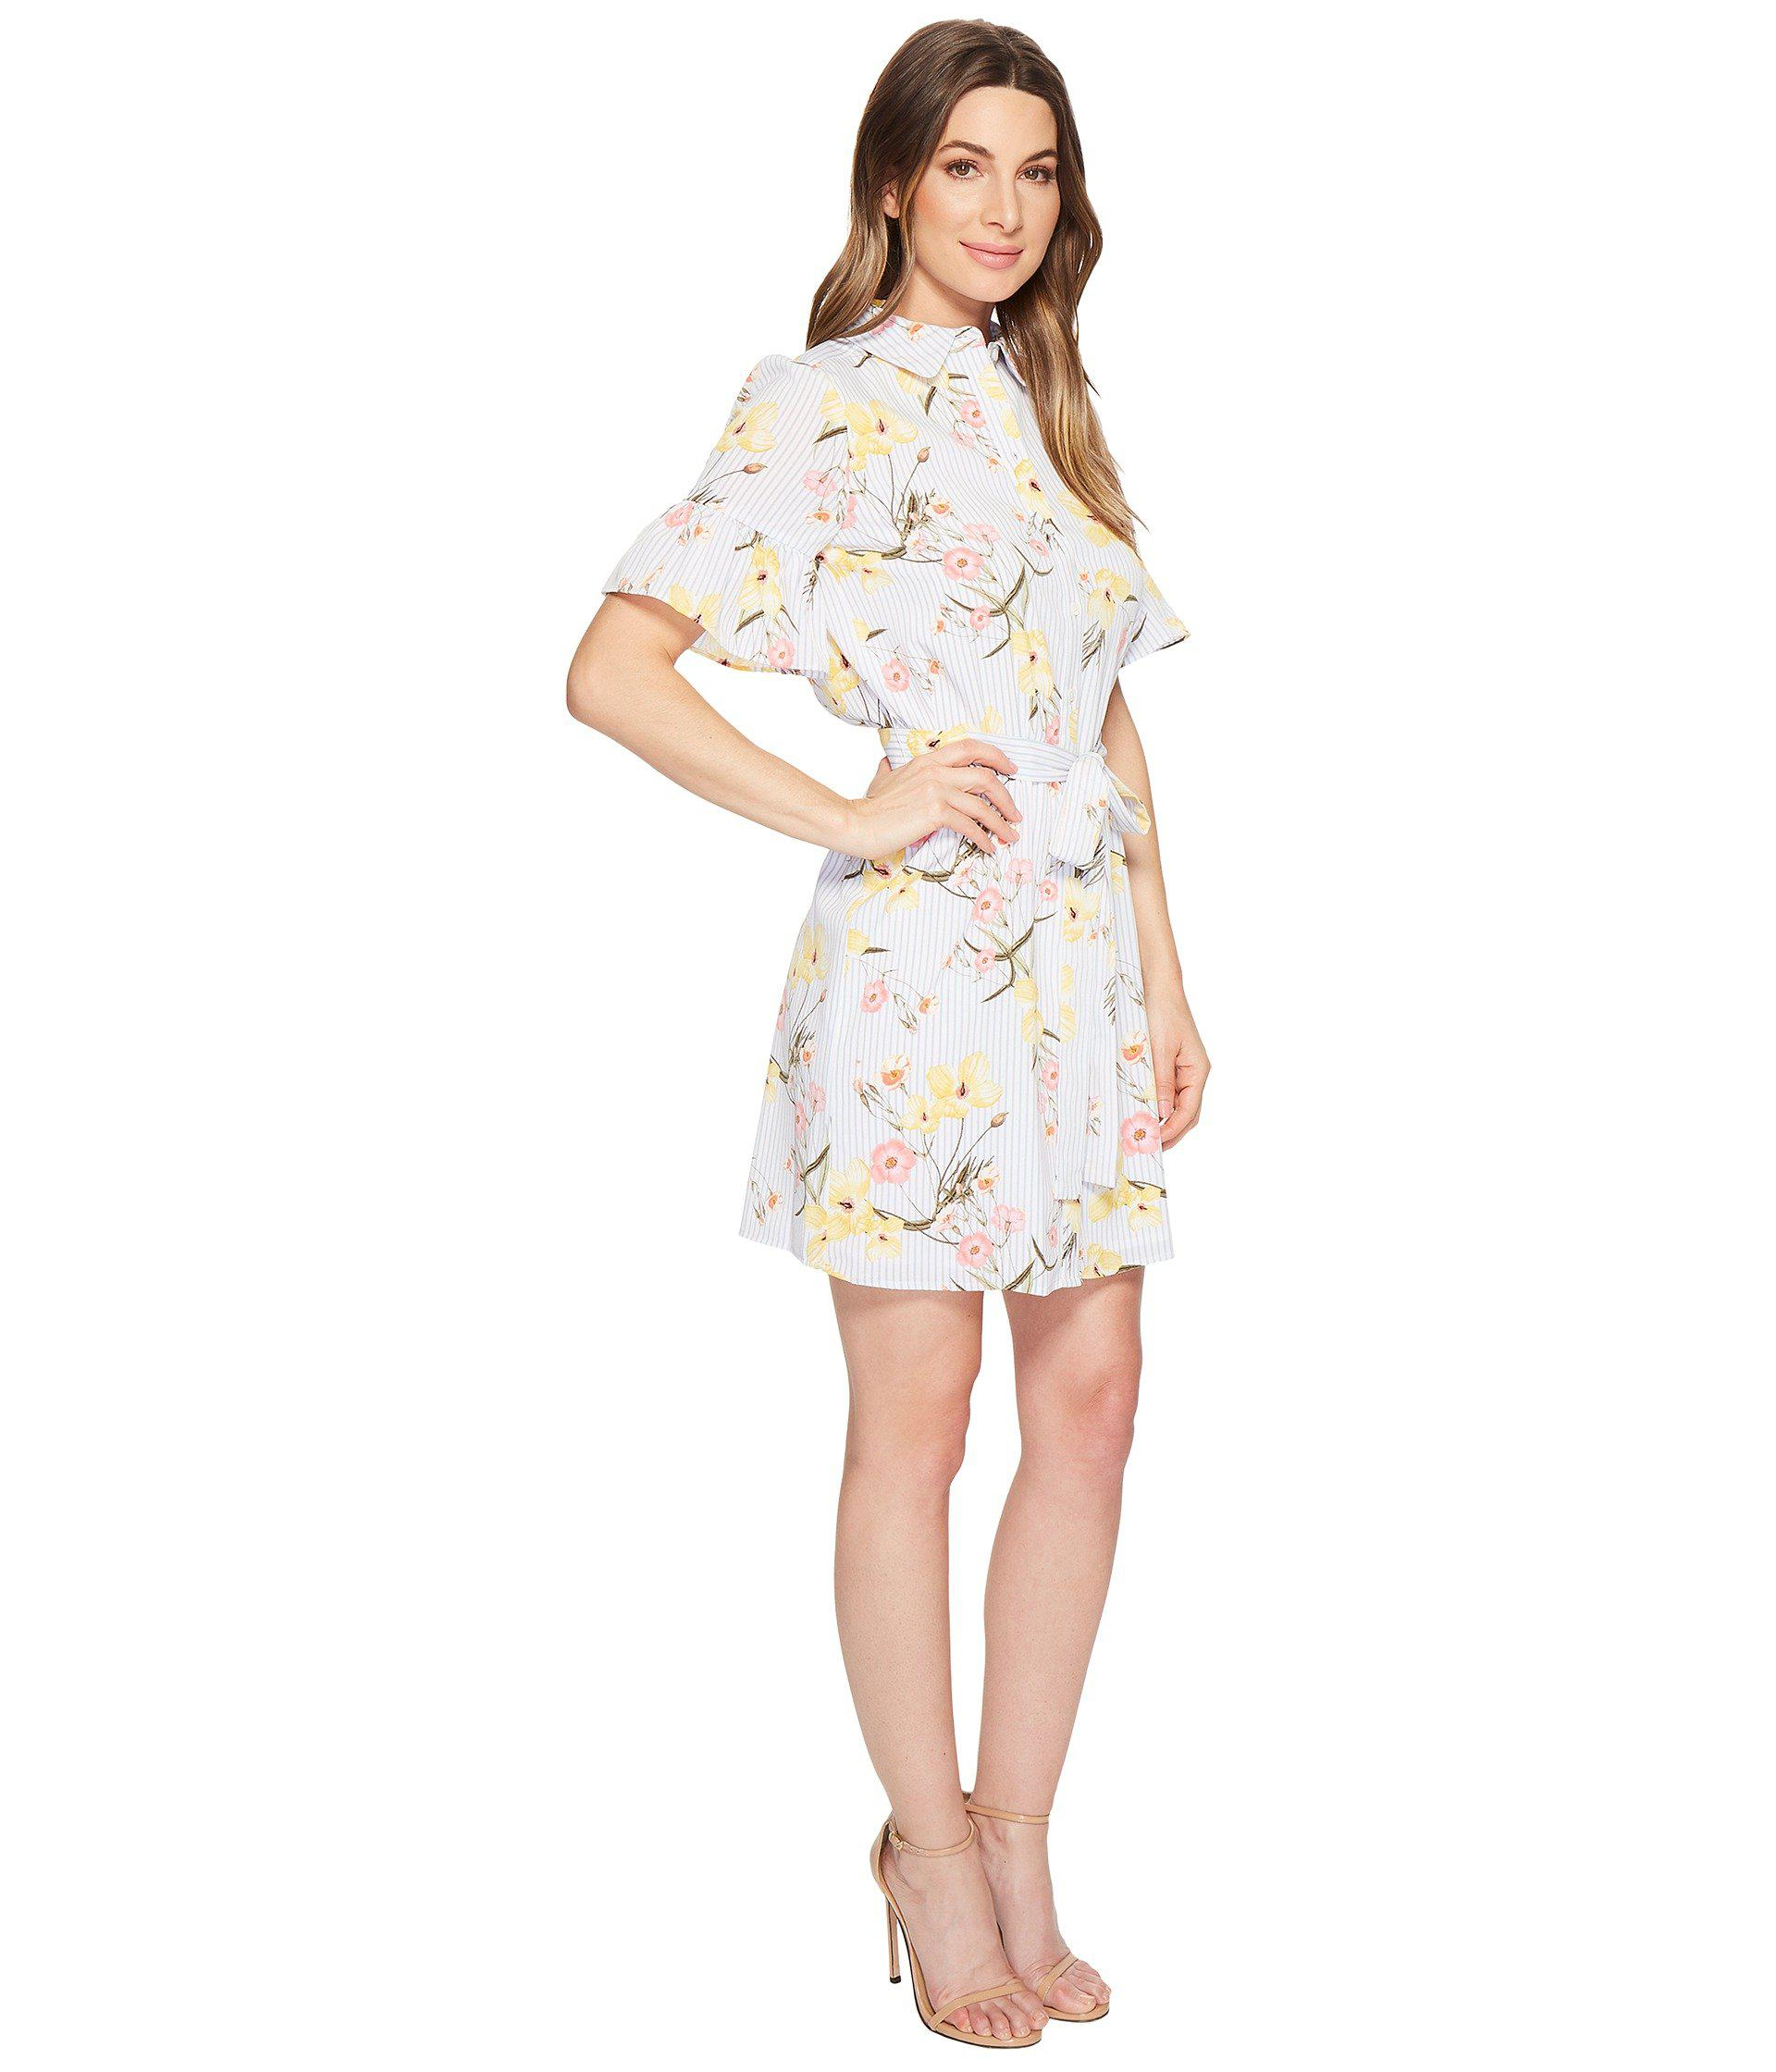 b52f90a5a5a Cece Botanical Blooms Shirtdress W/ Ruffle Sleeve (ultra White ...